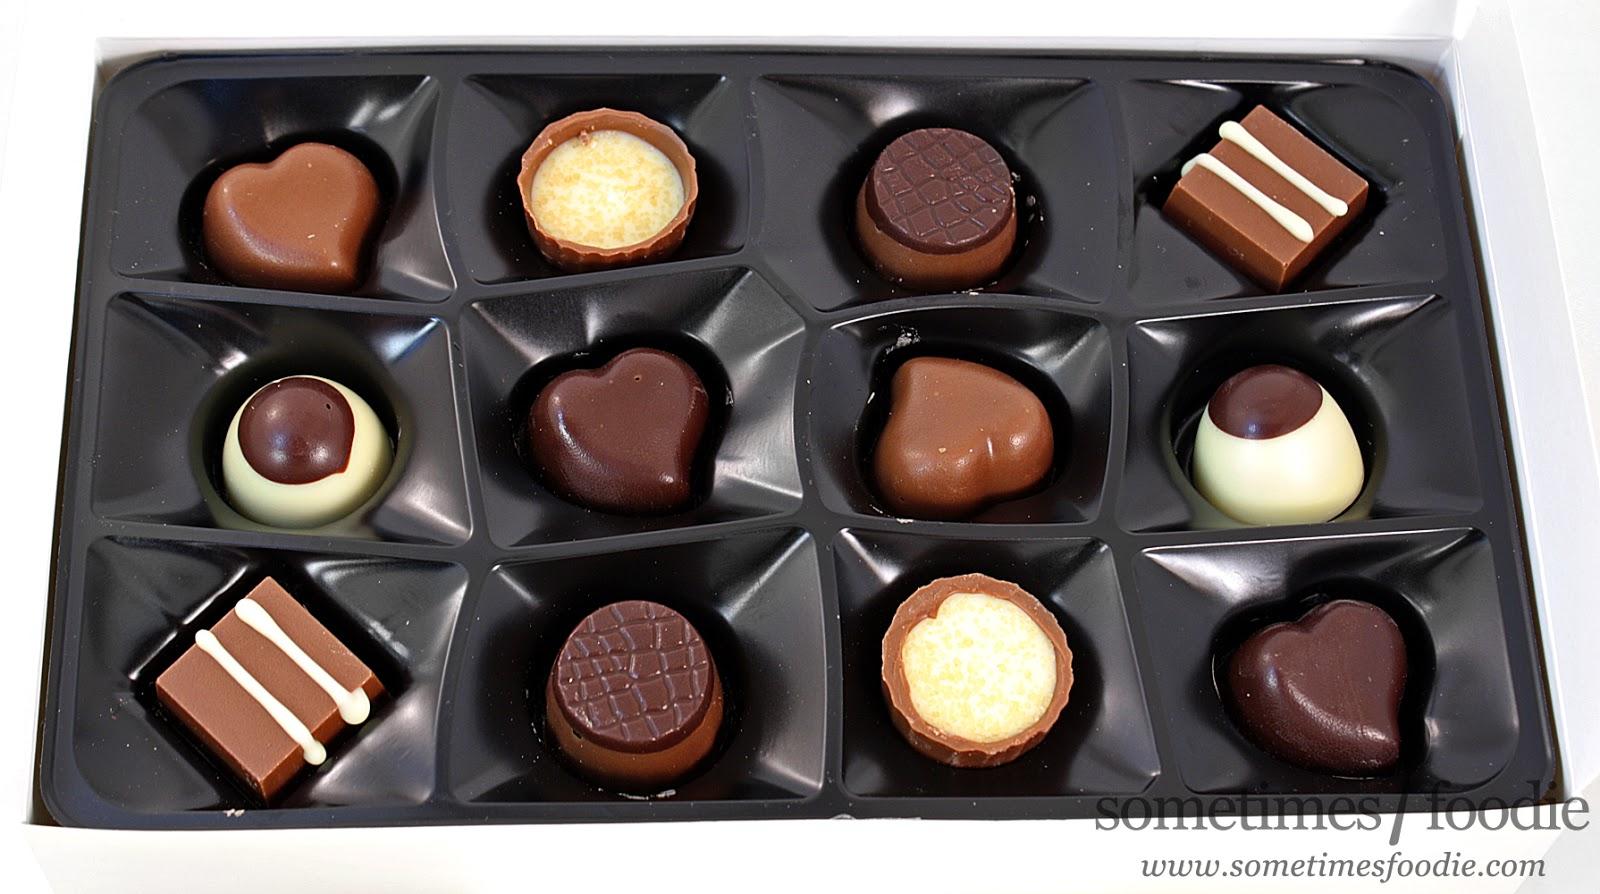 Sometimes Foodie: Handcrafted Luxury Chocolates - Aldi